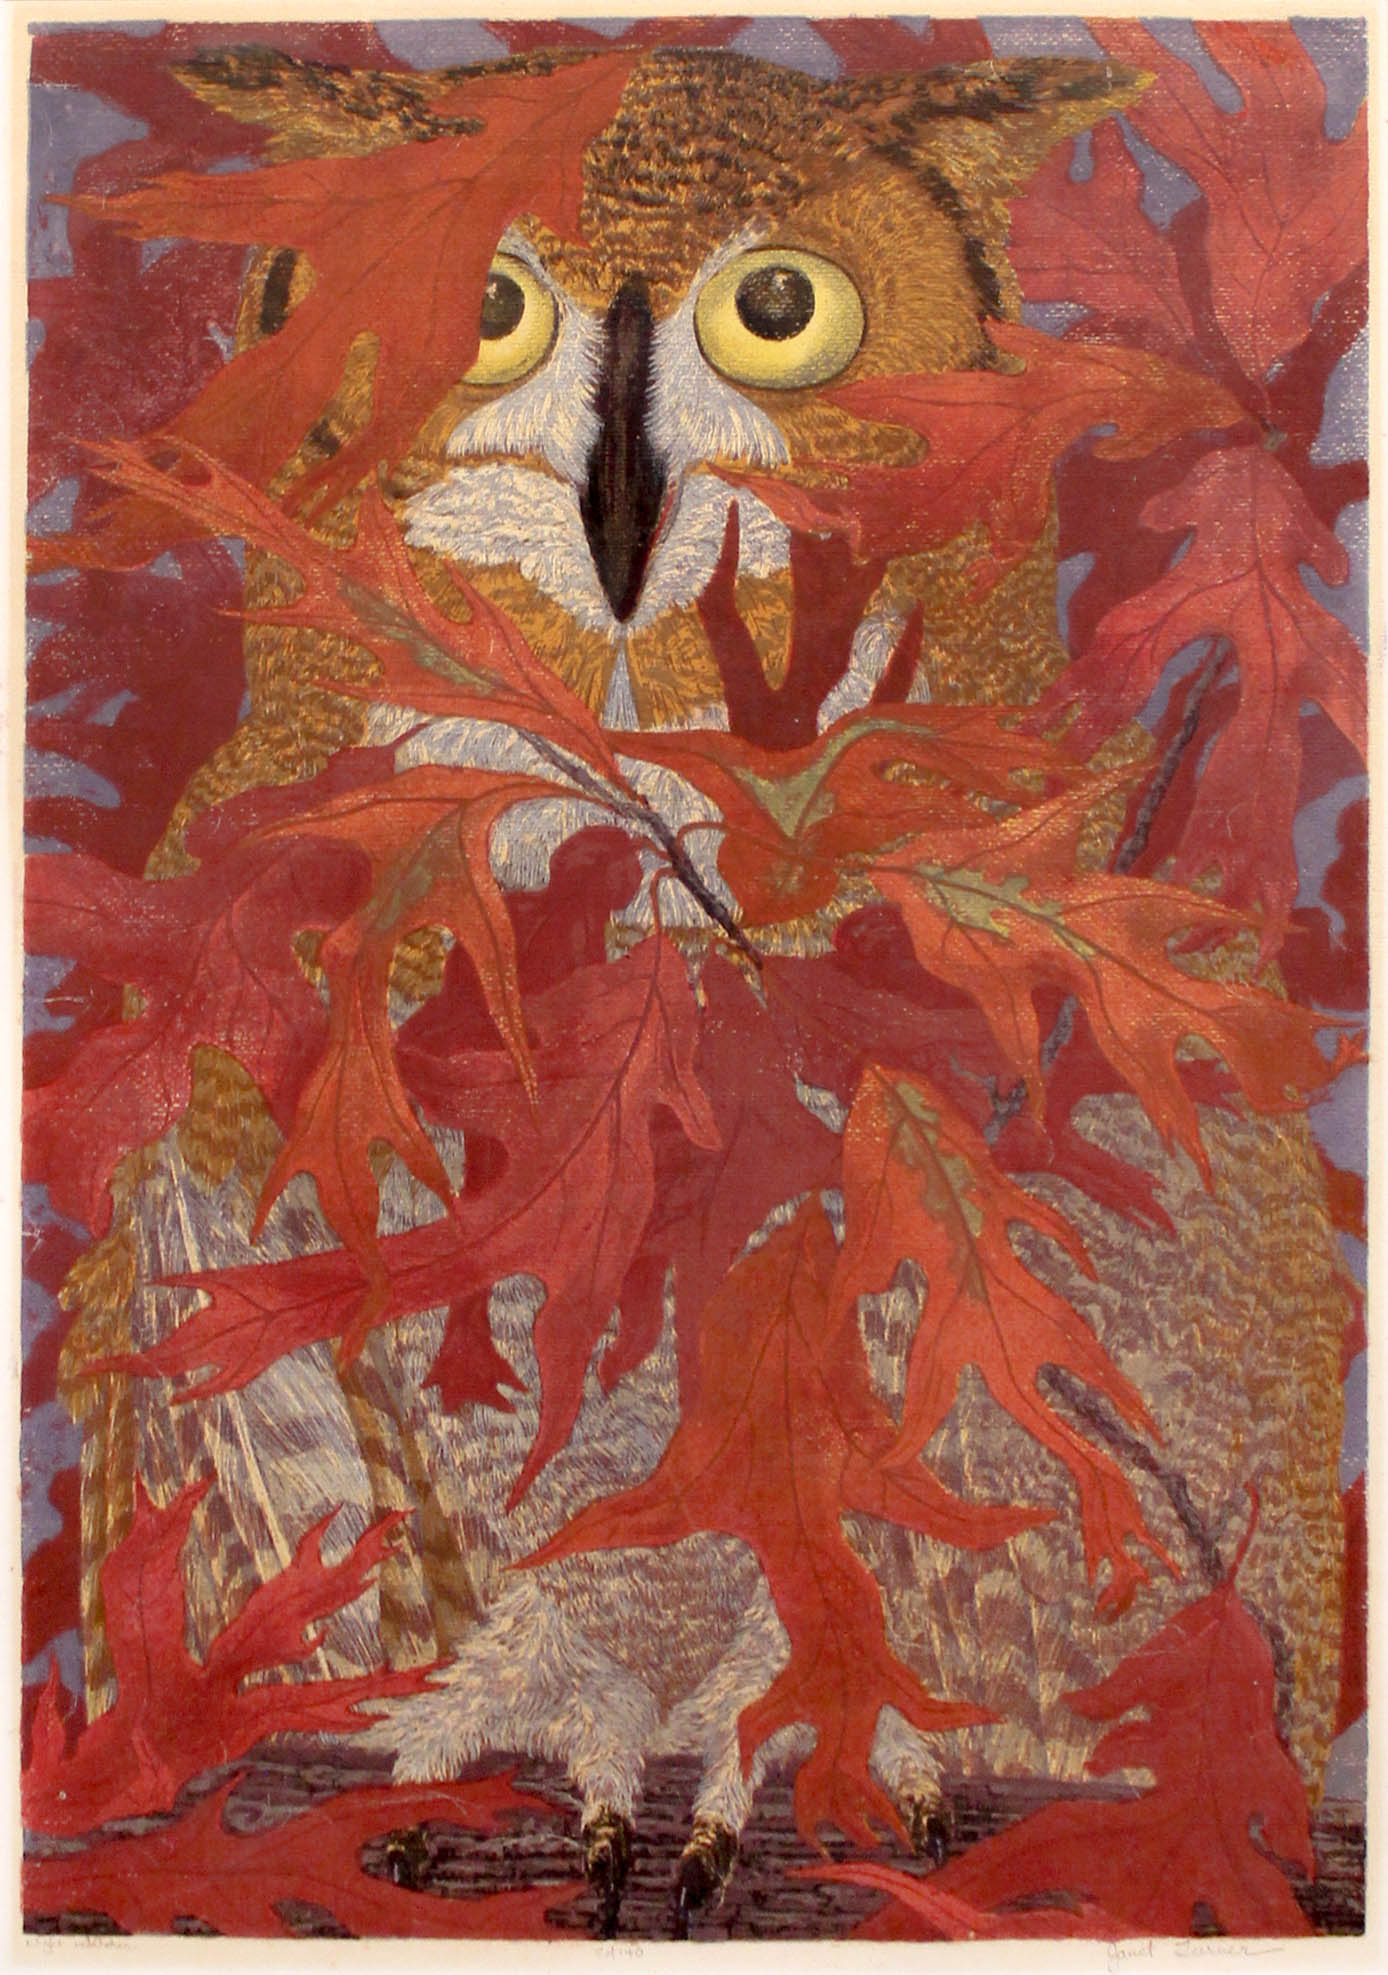 Janet Turner, Night Watcher, 1955.Serigraph.